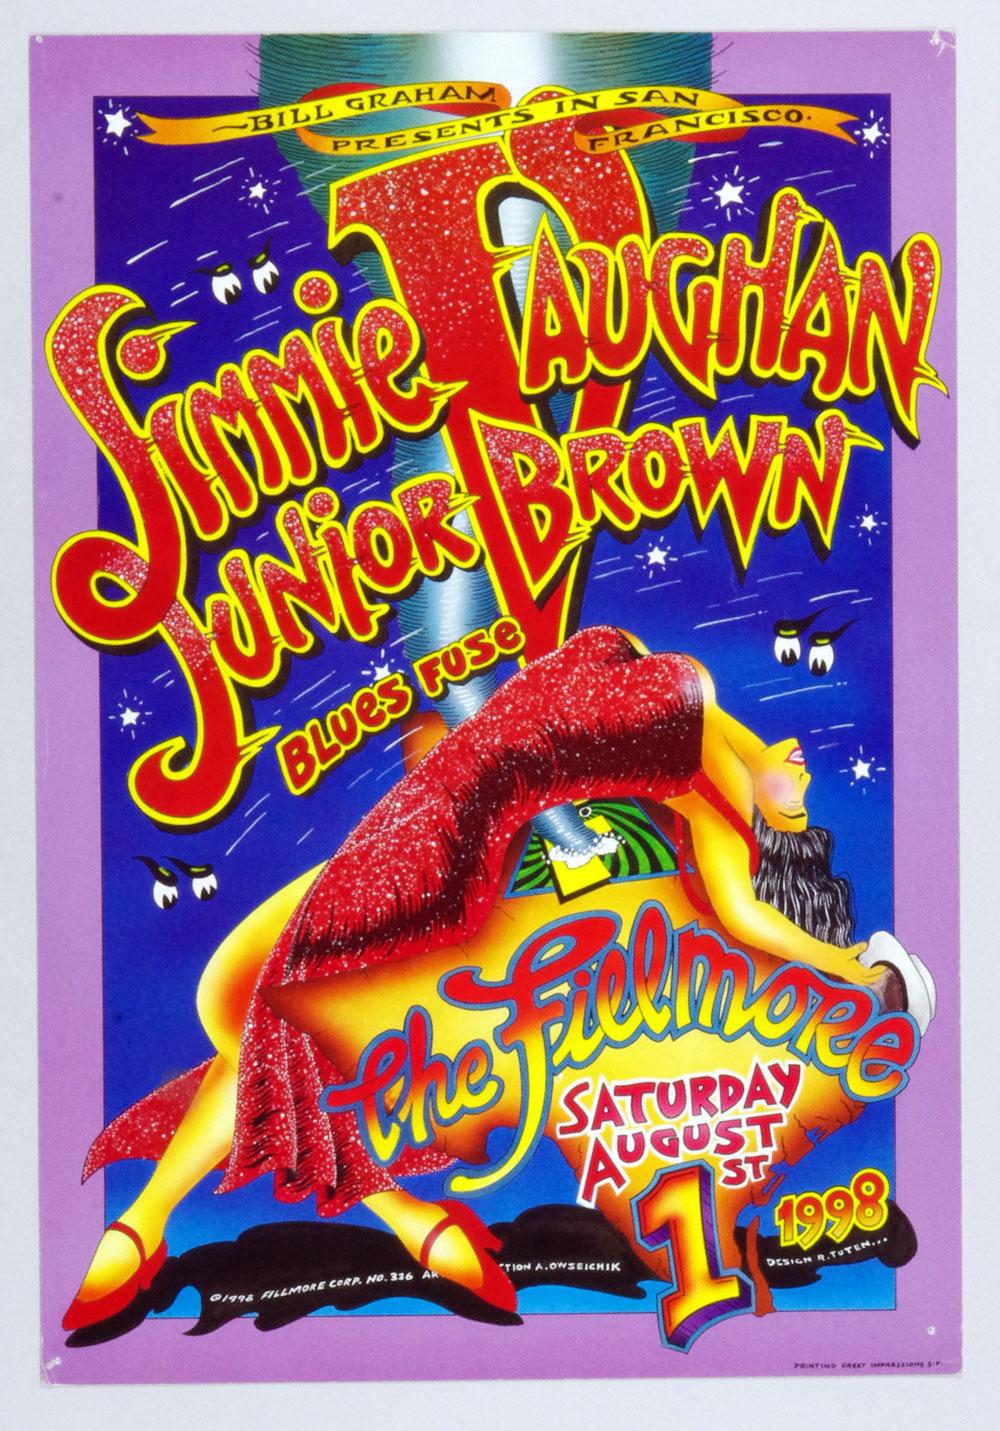 New Fillmore F336 Poster Jimmie Vaughan Junior Brown 1988 Aug 1